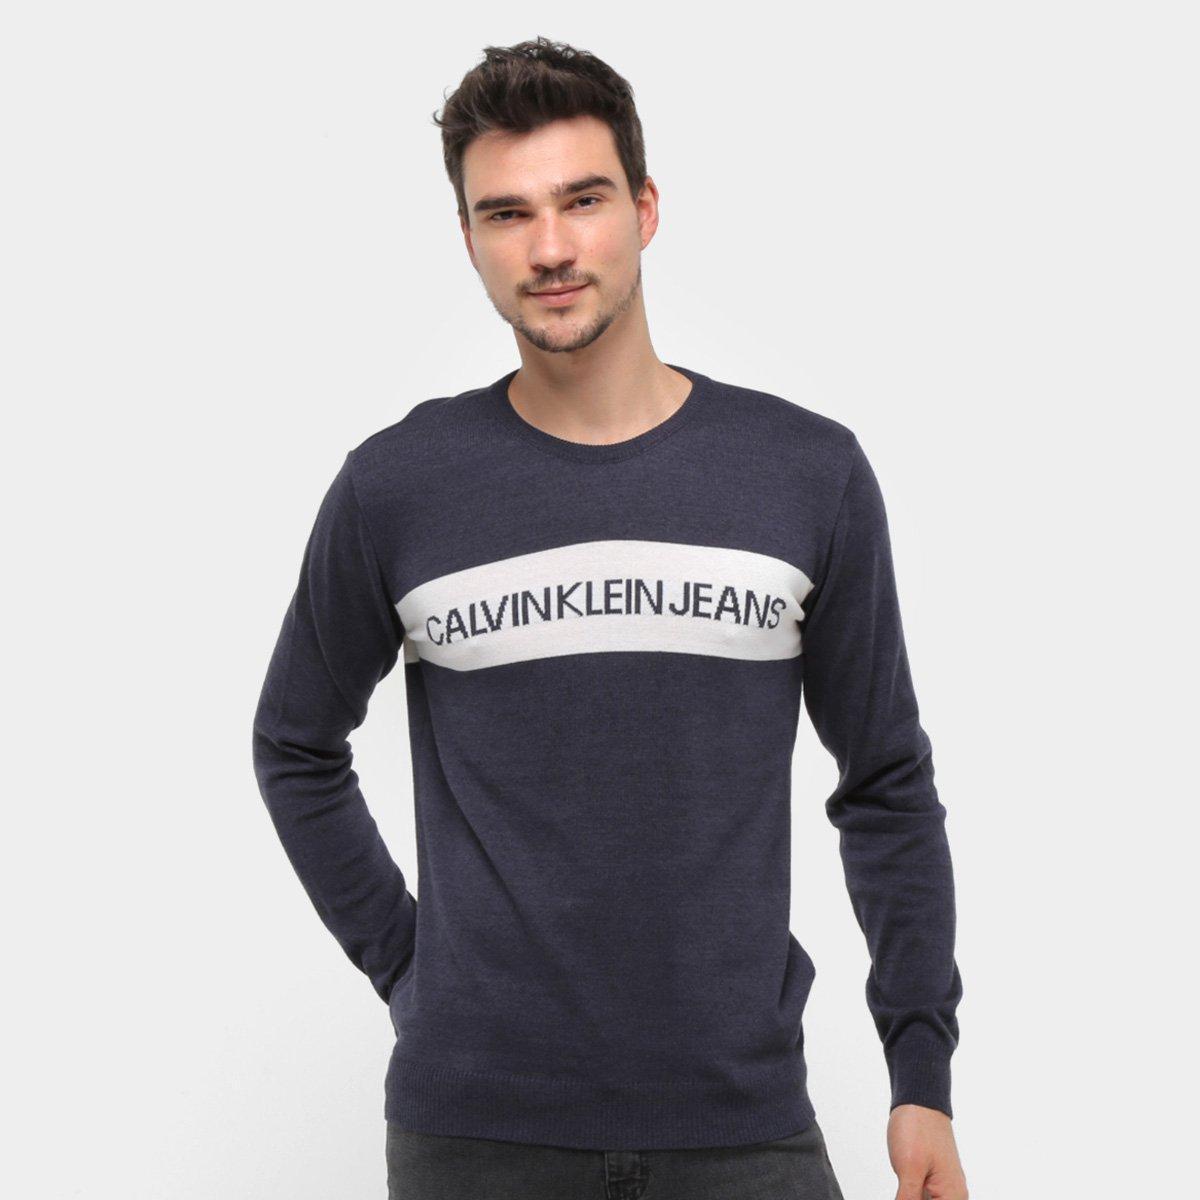 Tricô Calvin Klein Jacquard Masculino